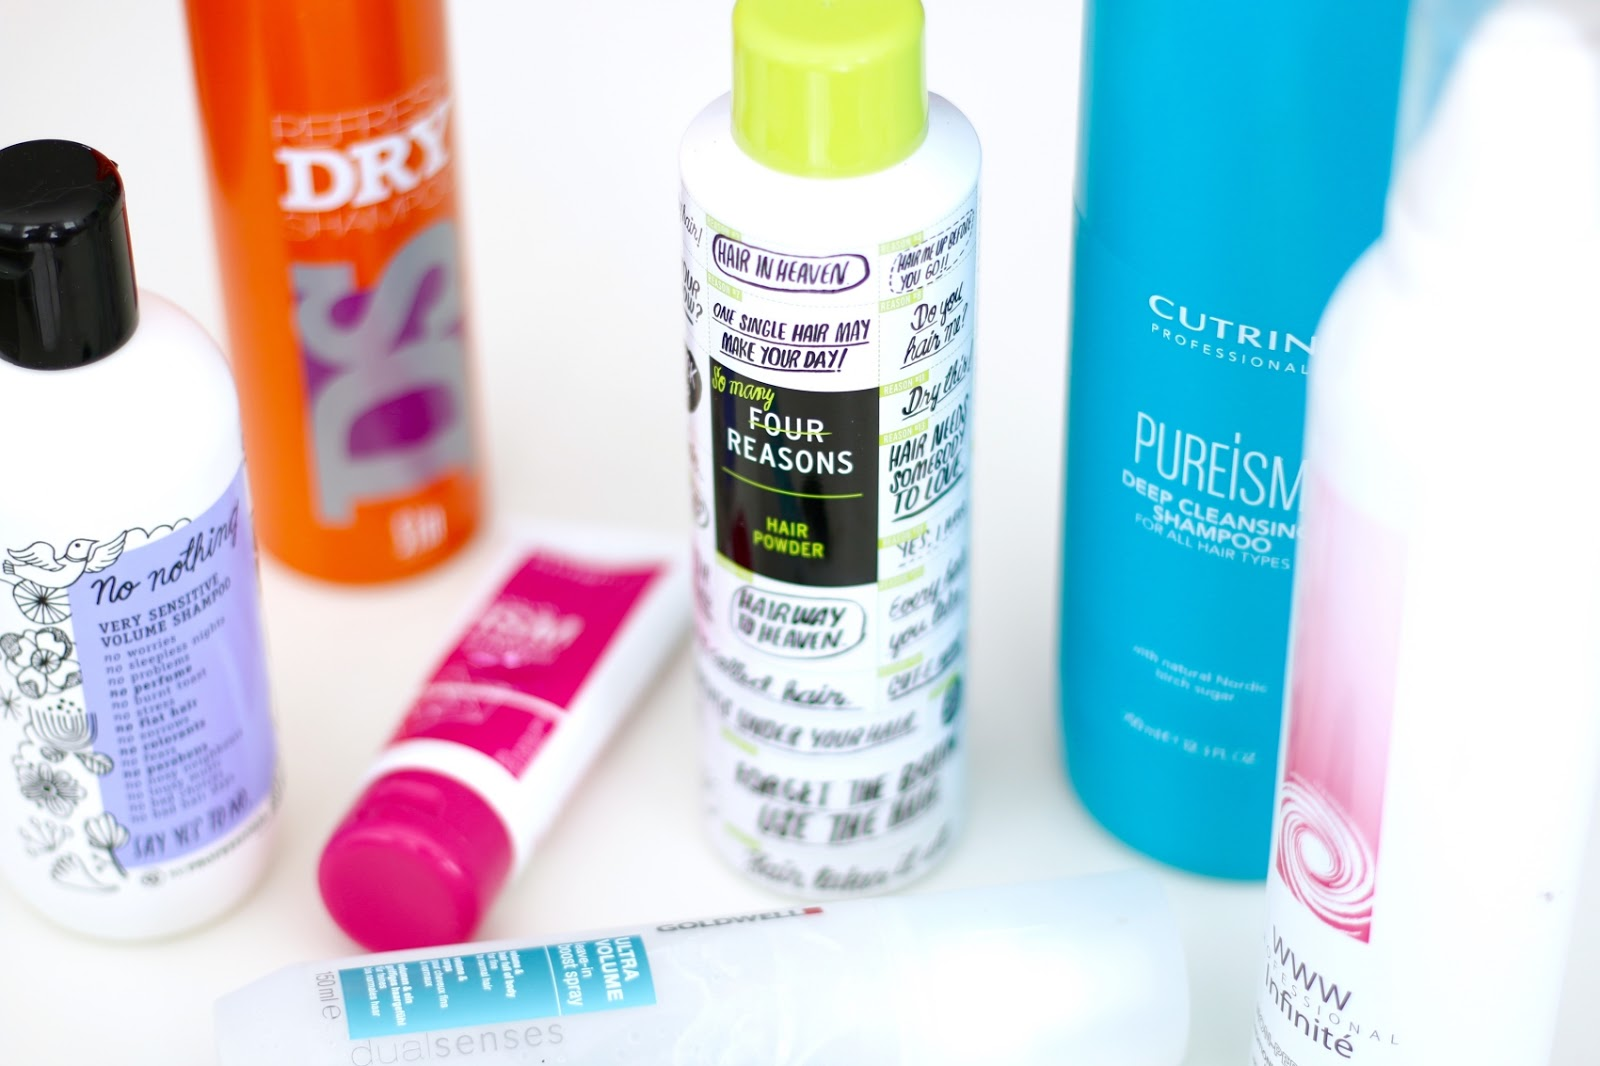 Four reasons hair powder, sim sensitive dry shampoo, no nothing shampoo, haircare empties